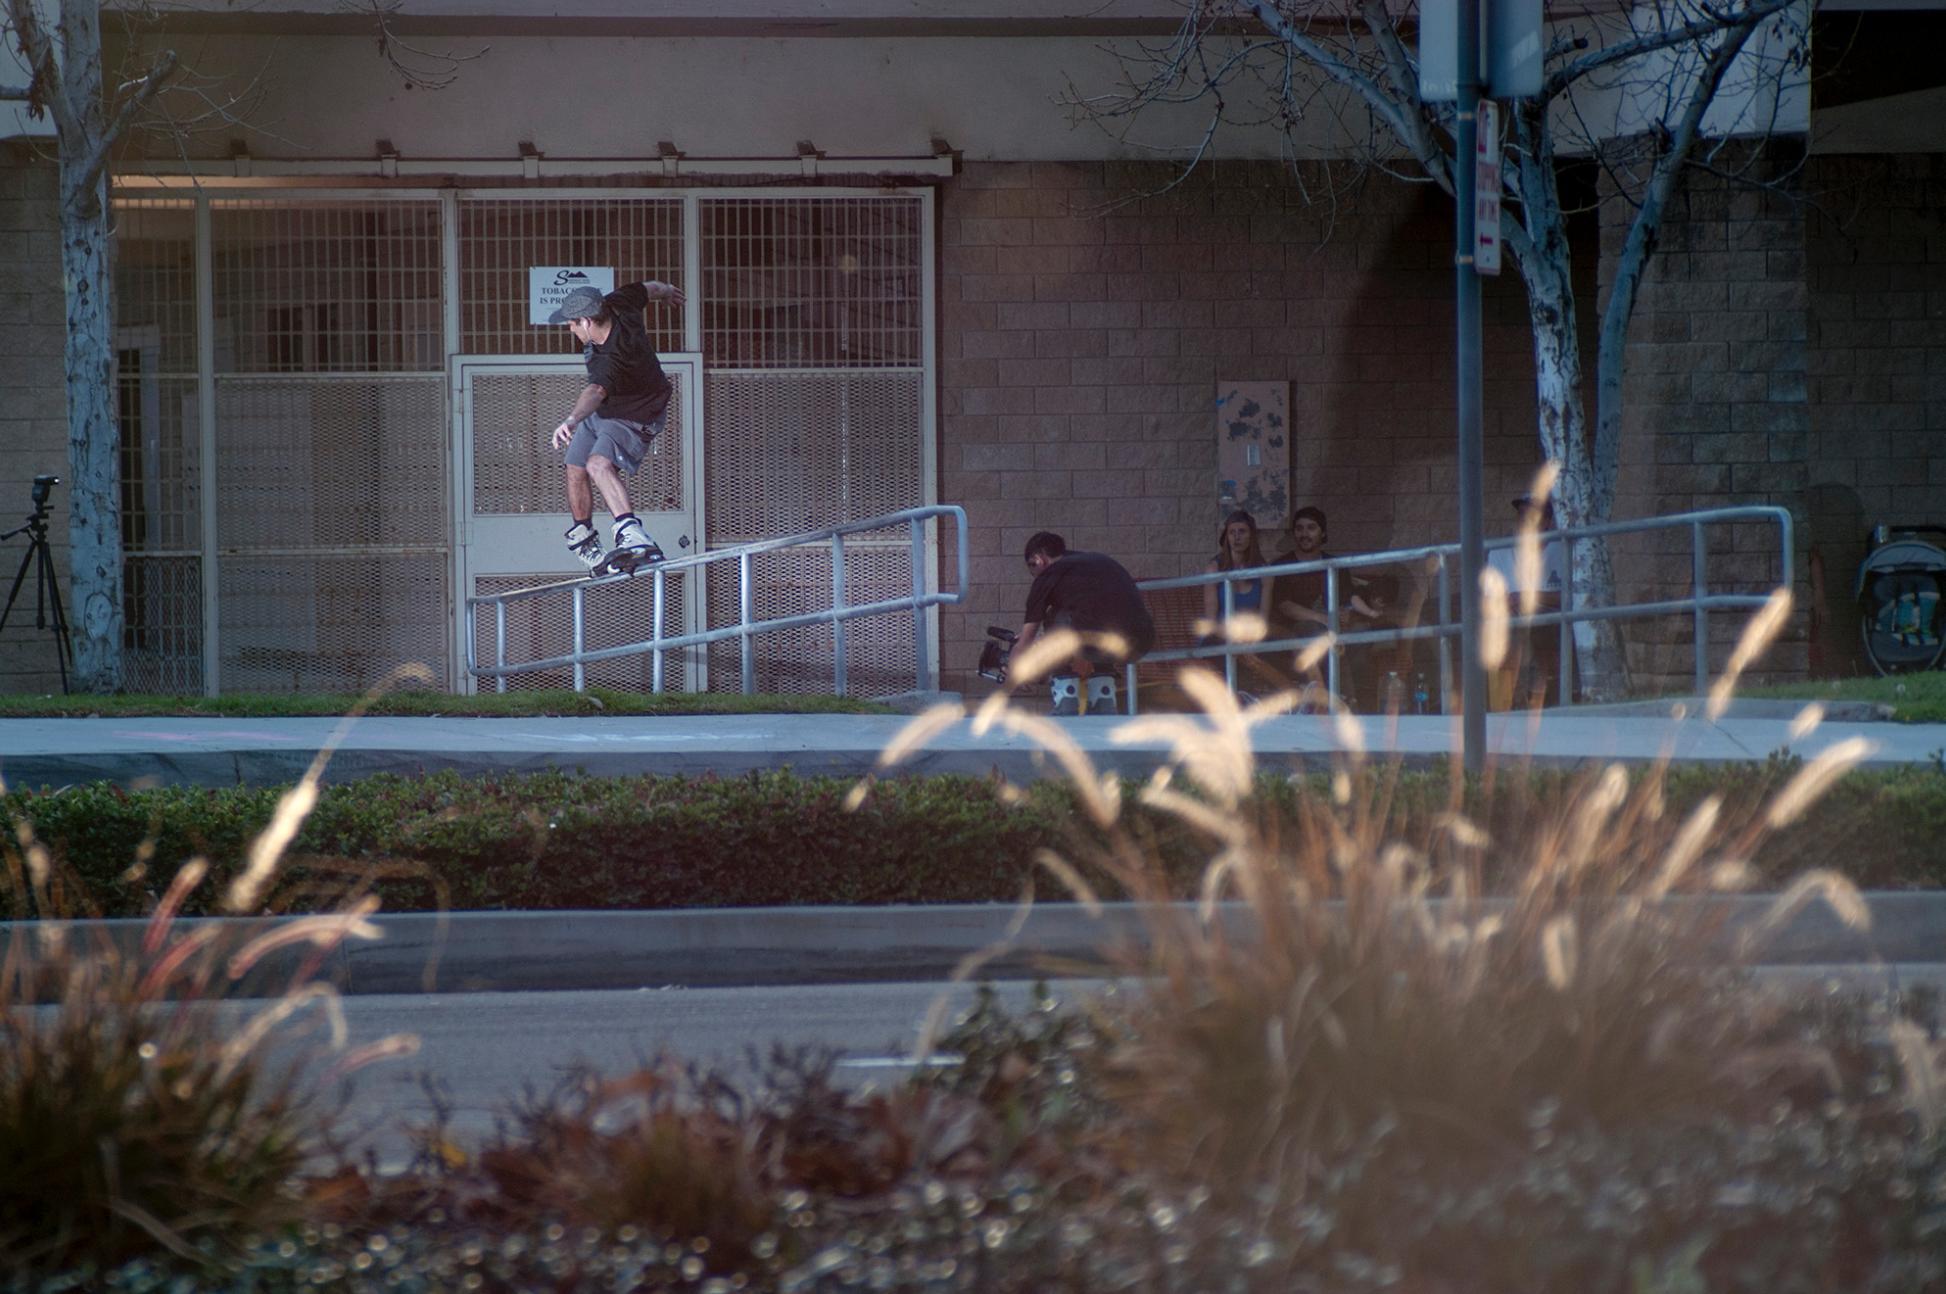 PHOTO JOURNAL: Sean Macgowan #9